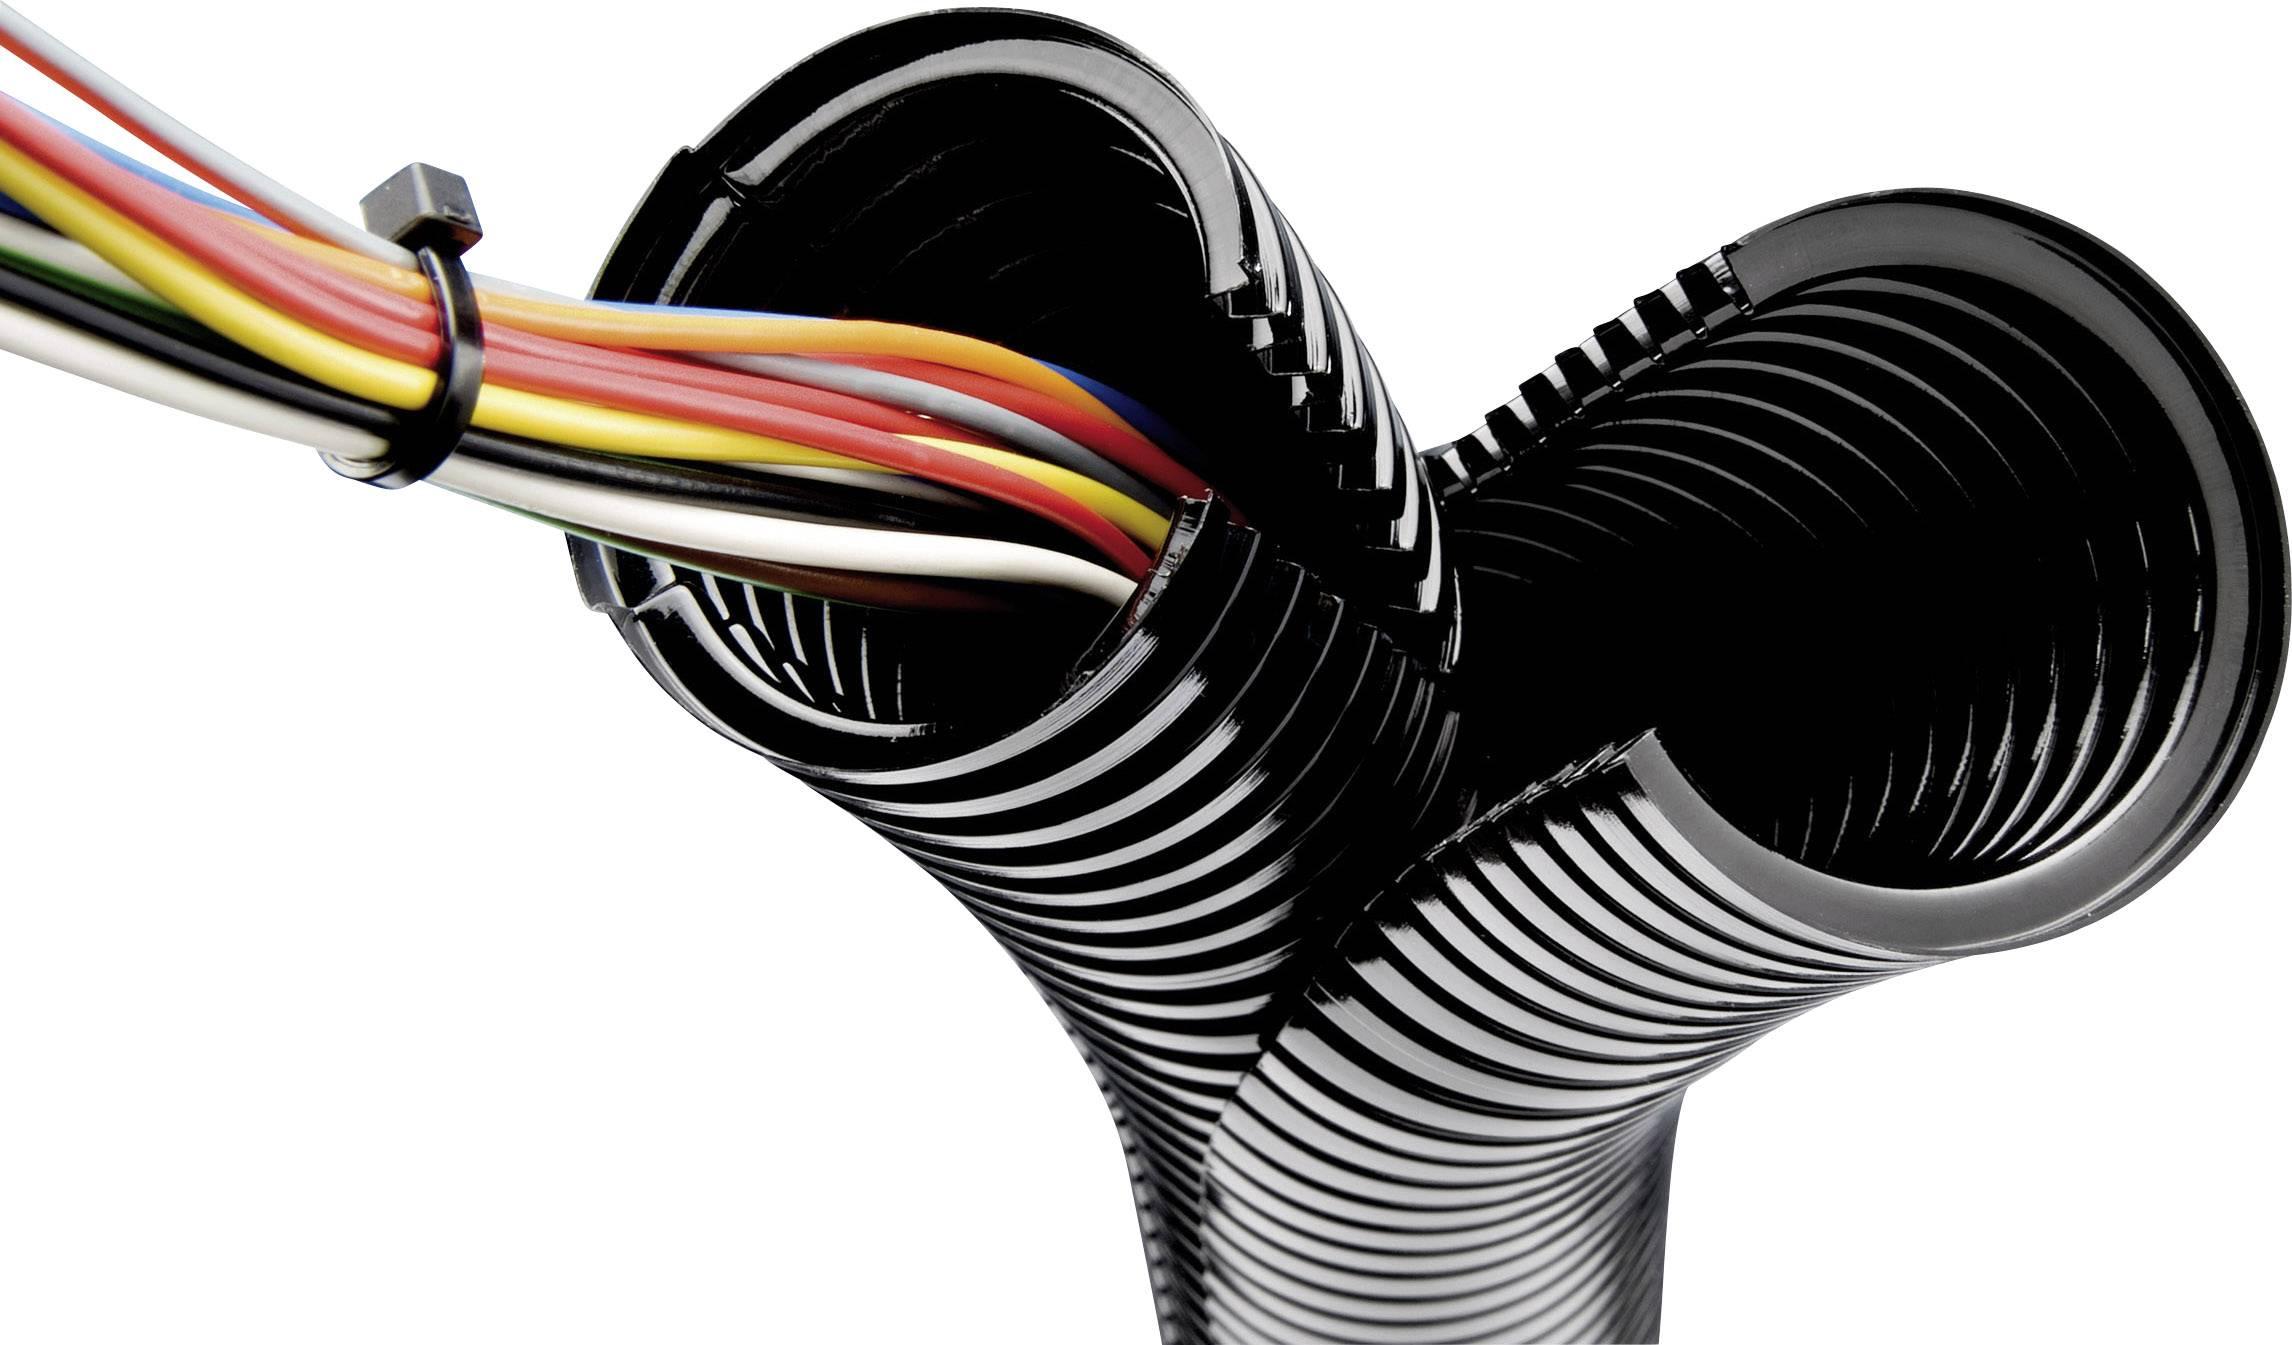 Ochranná hadica na káble LappKabel SILVYN® SPLIT 23 61806650, 23.70 mm, čierna, metrový tovar